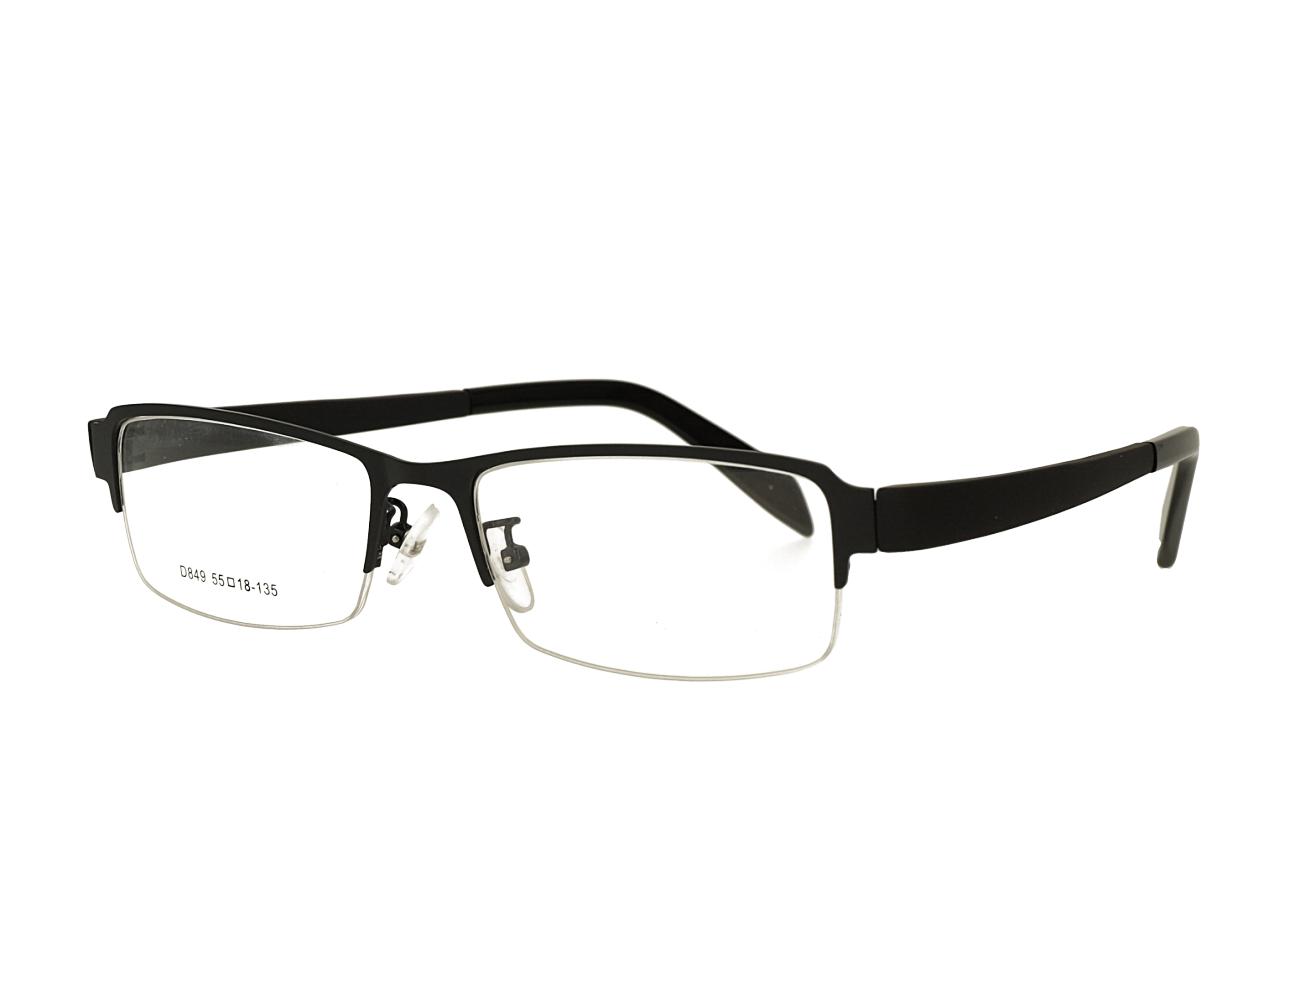 Half rim man's designer metal eyewear with TR90 temples